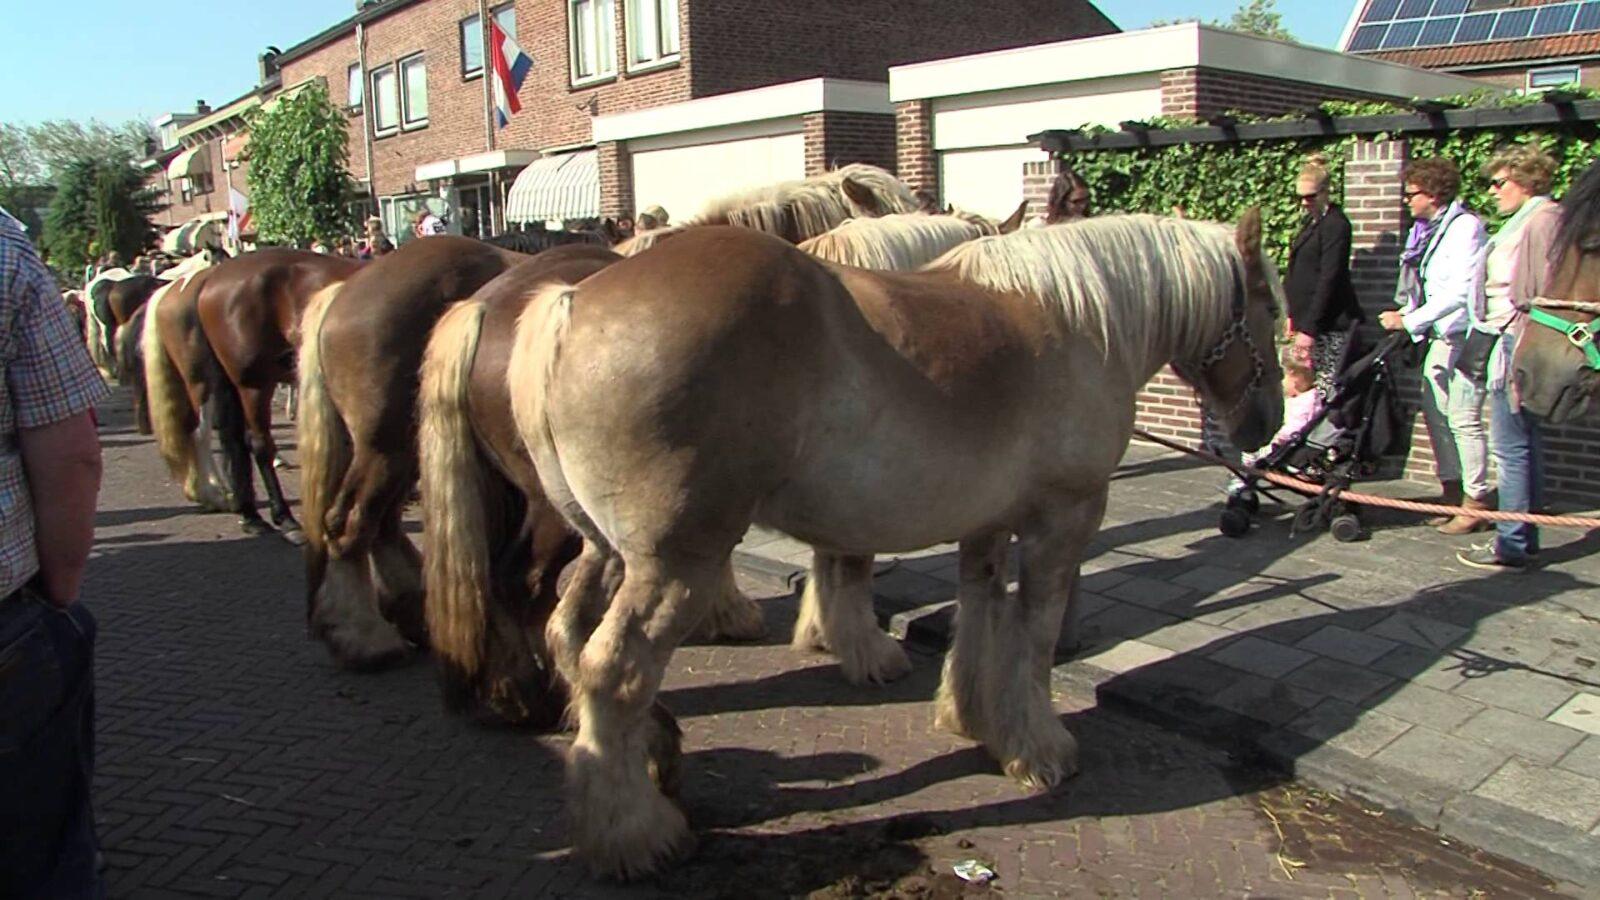 Hollandse Avond in Het Dorpshuis Valkenburg | RTV Katwijk